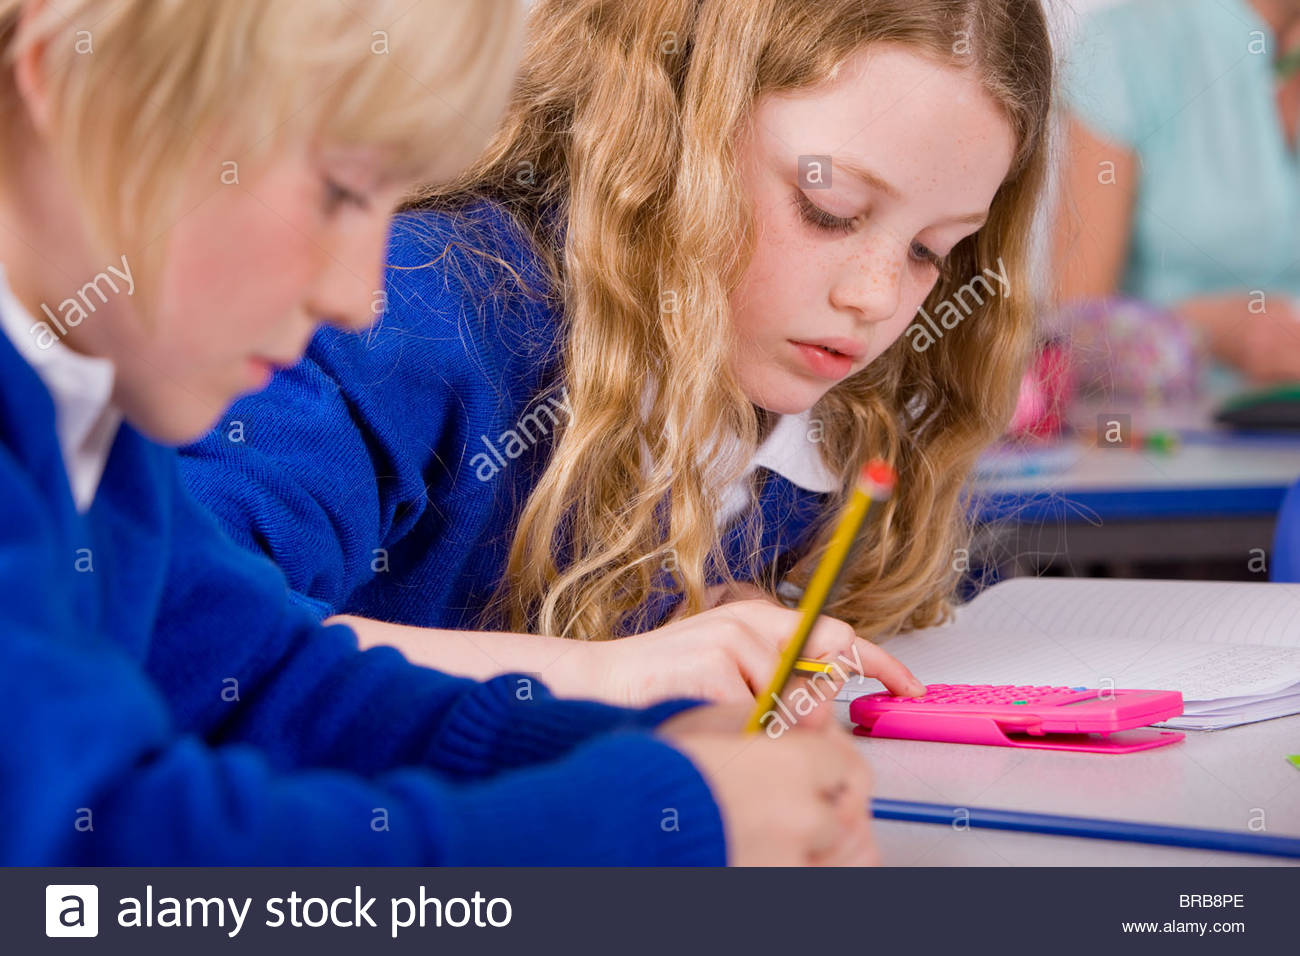 School children doing mathematics in classroom - Stock Image